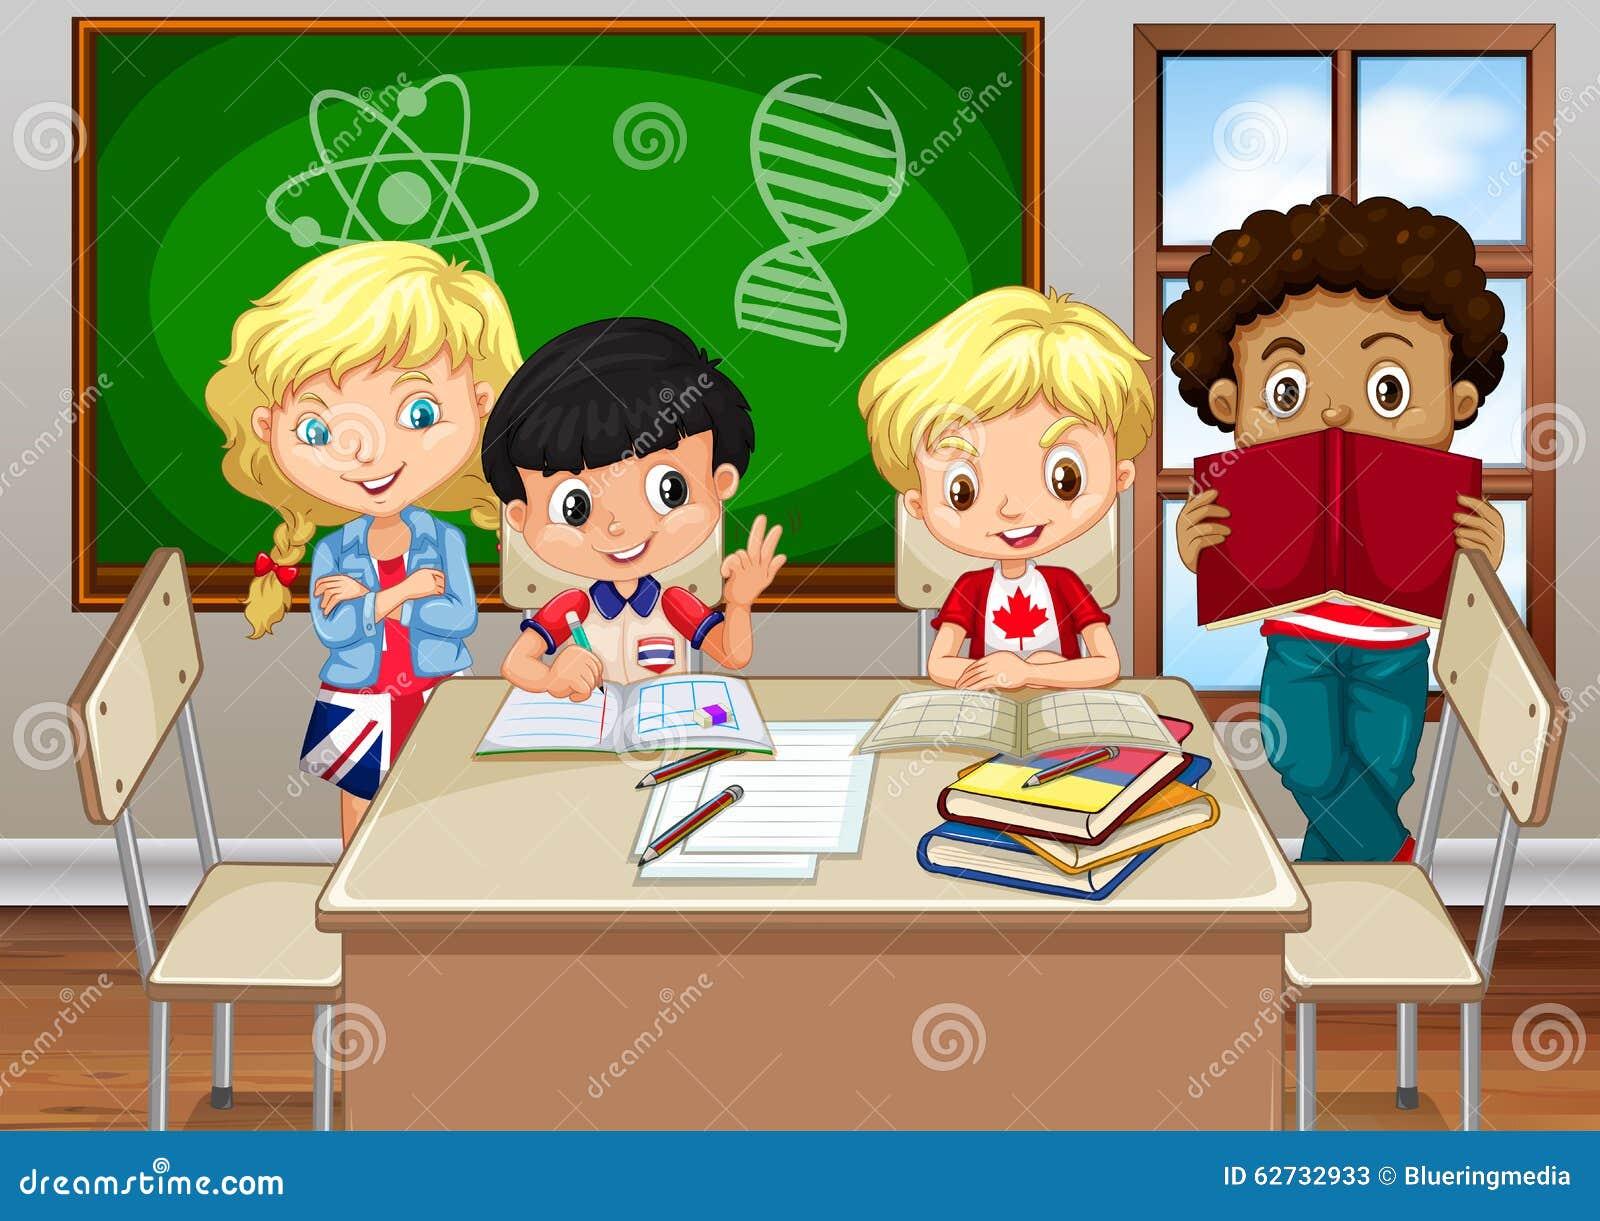 Dibujos Animados De Animales Estudiando: Children Studying In The Classroom Cartoon Vector